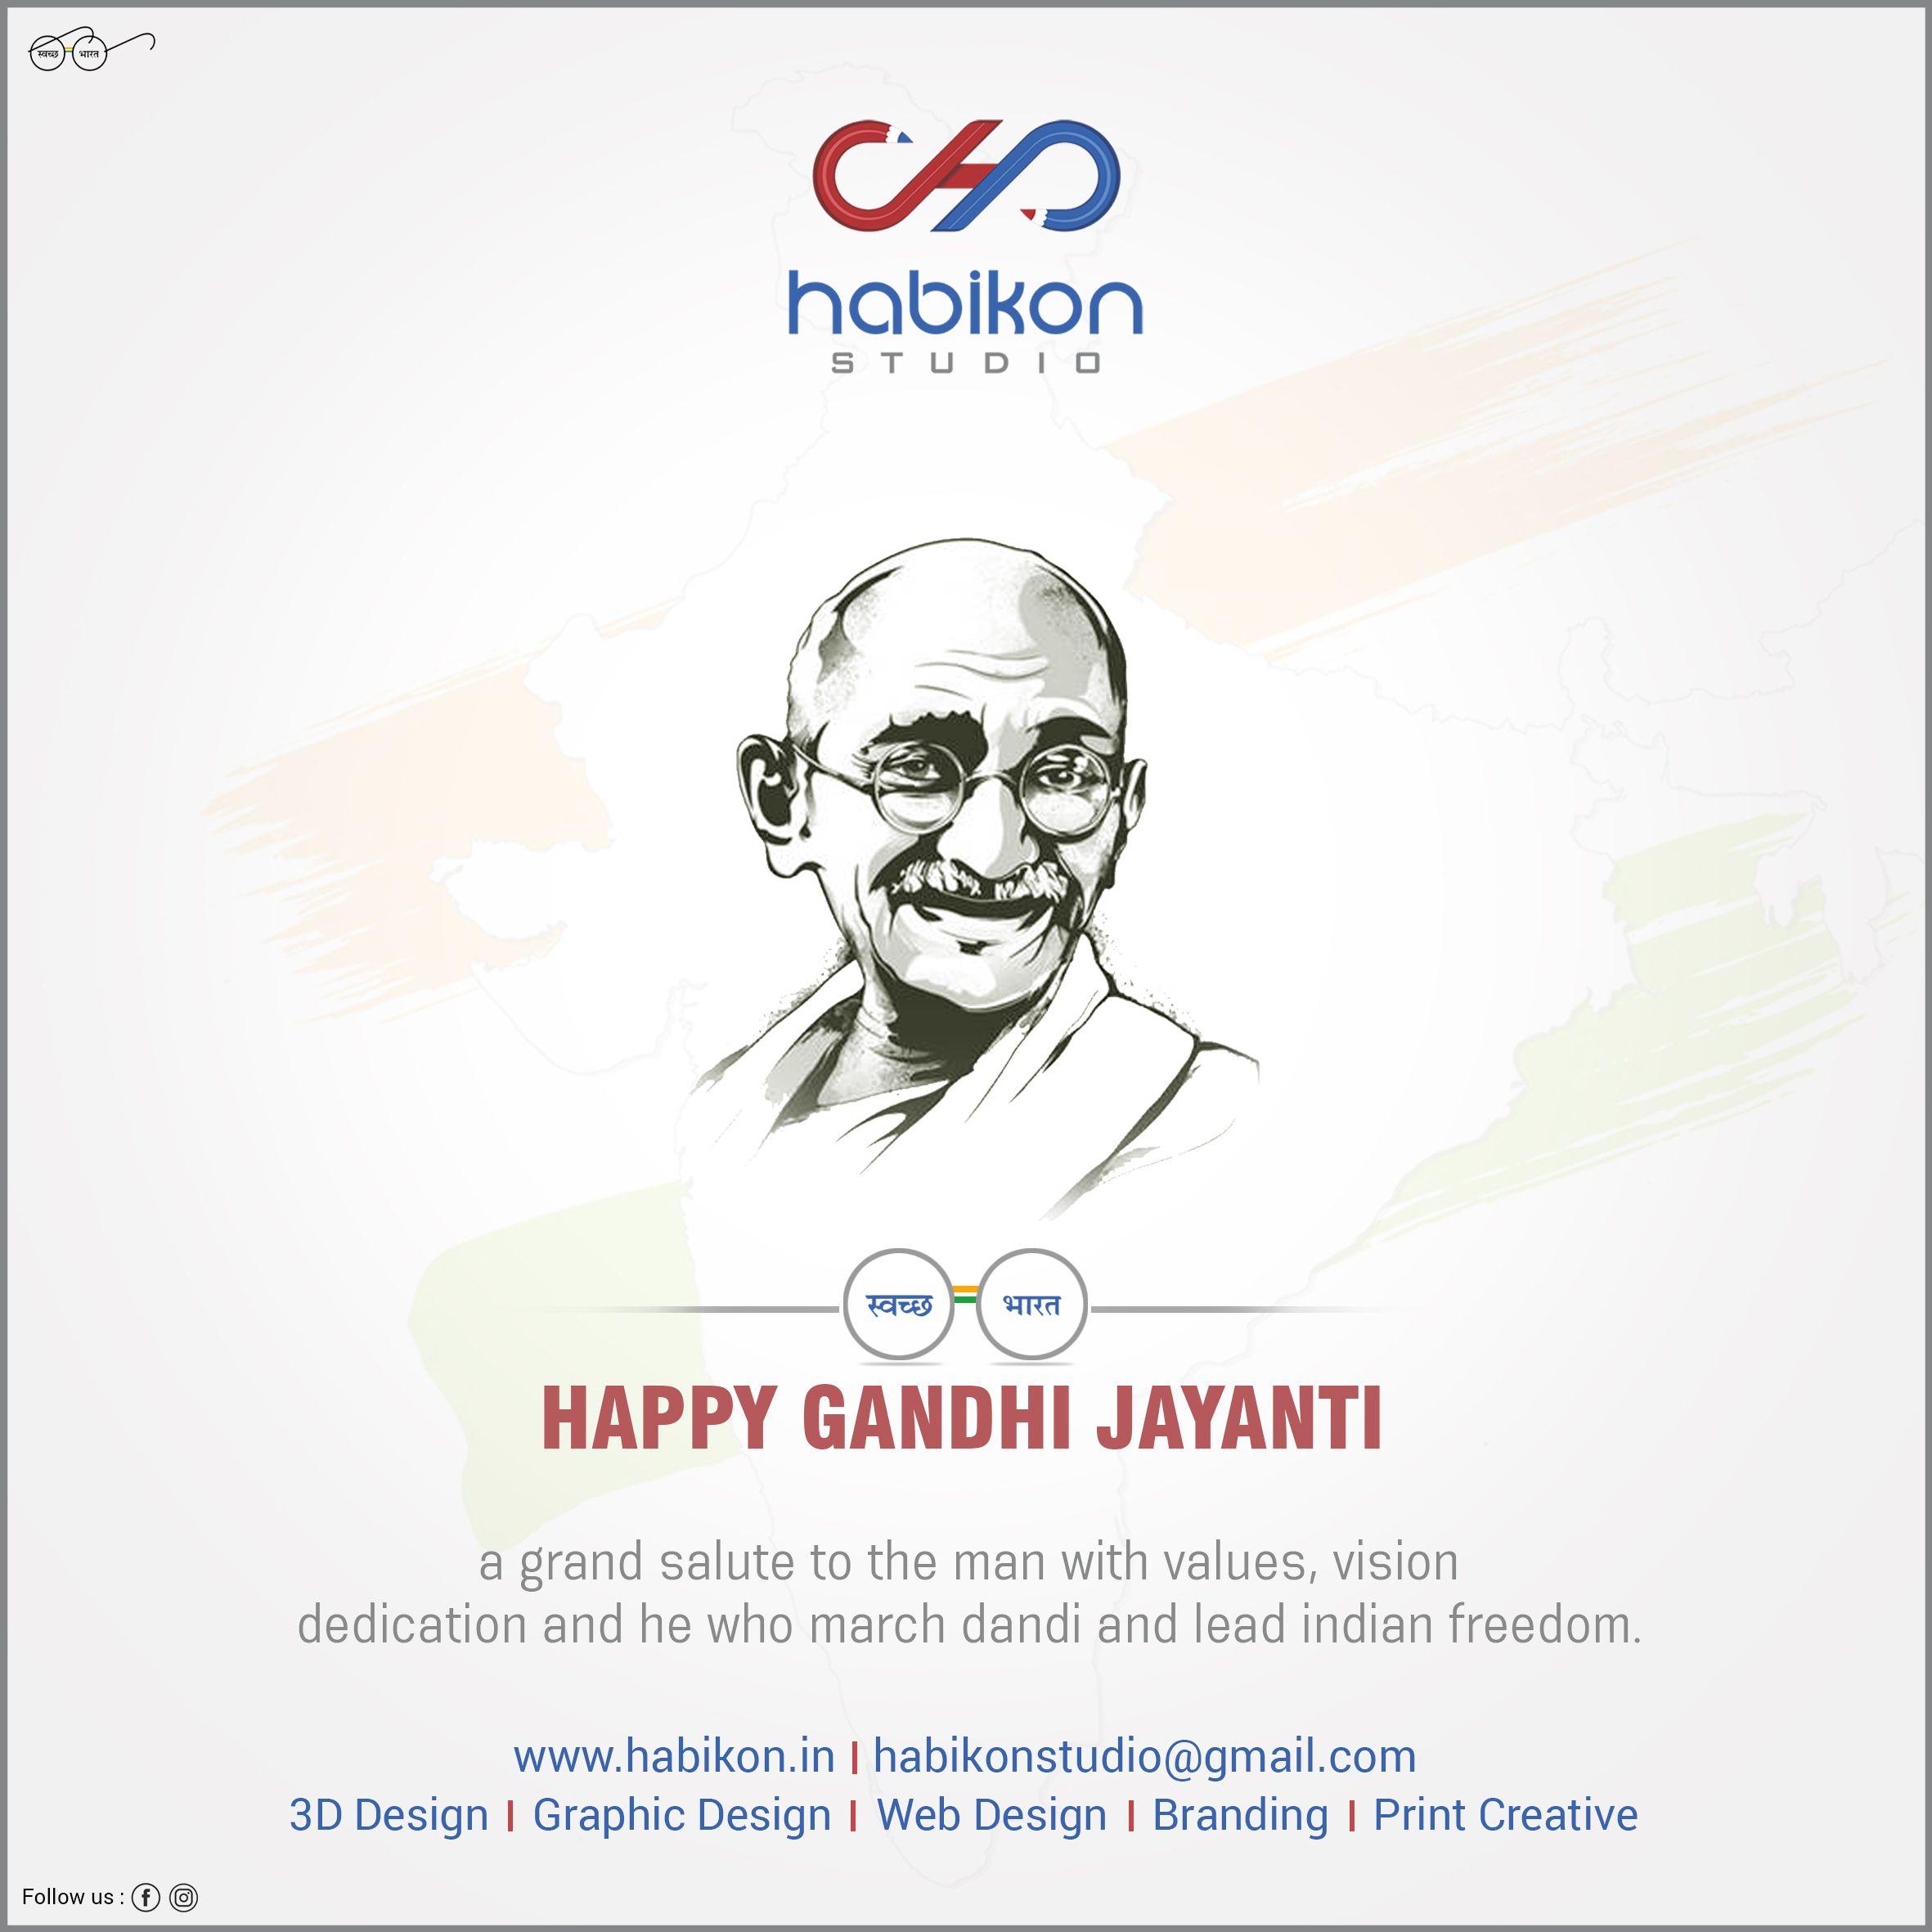 GANDHI JAYANTI in 2020 Happy gandhi jayanti, Jayanti